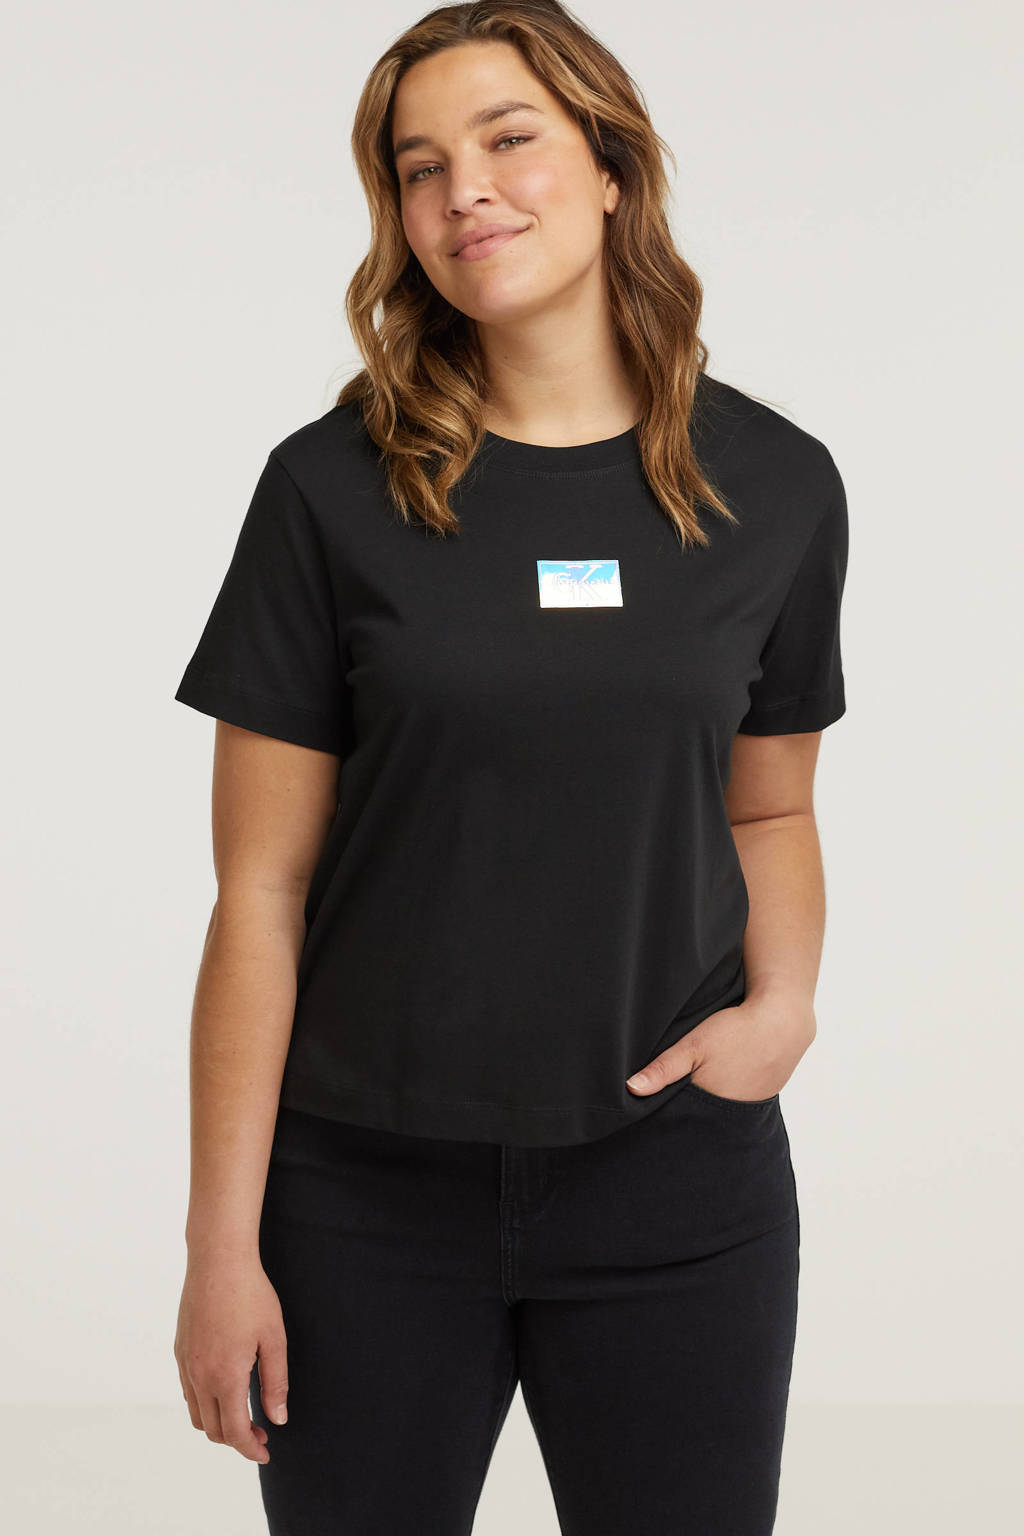 CALVIN KLEIN Plus T-shirt van biologisch katoen zwart/multi, Zwart/multi